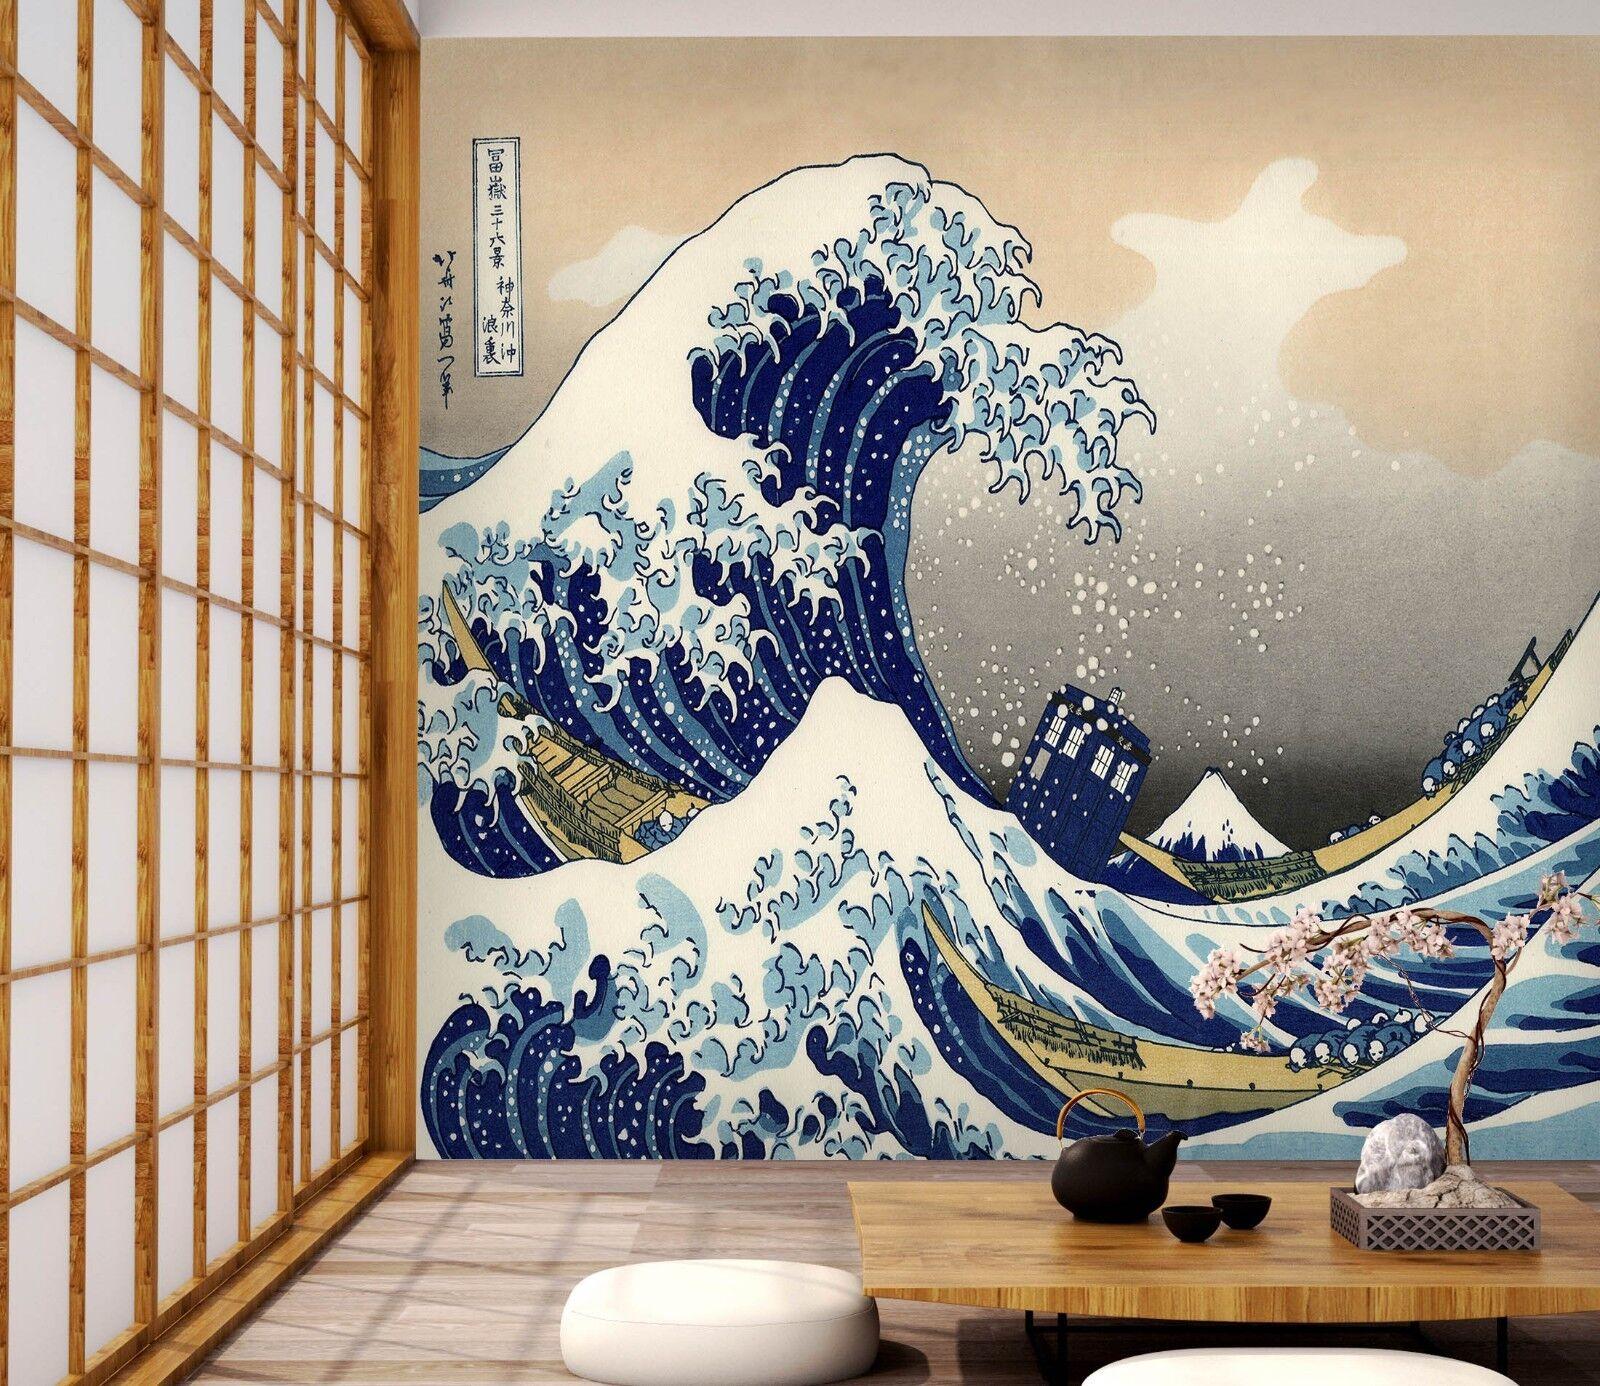 3D Surf Boat Cartoon 45 Wallpaper Murals Wall Print Wallpaper Mural AJ WALL AU